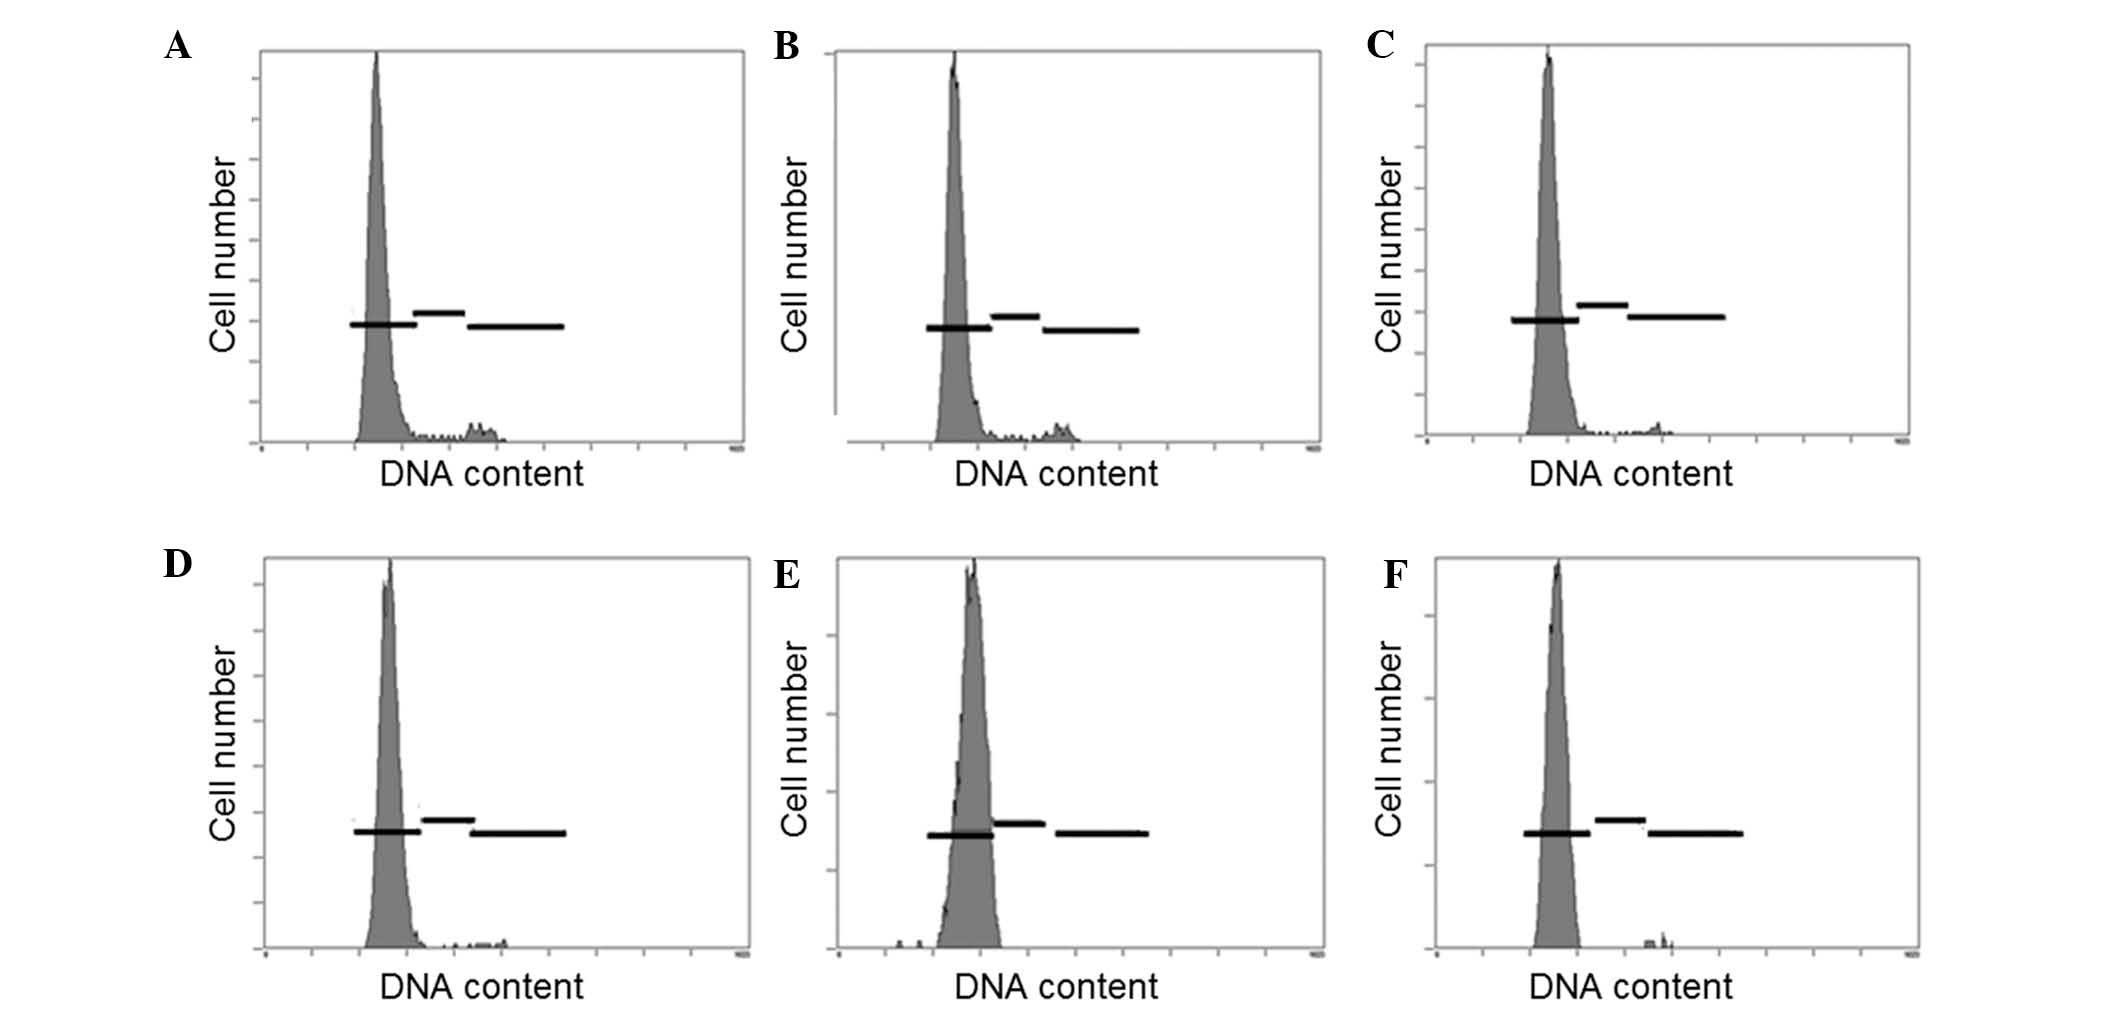 Cell Cycle Distribution Of Bone Marrow Mesenchymal Stem Cells Following Irradiation Was Yzed Using Flow Cytometric Ysis